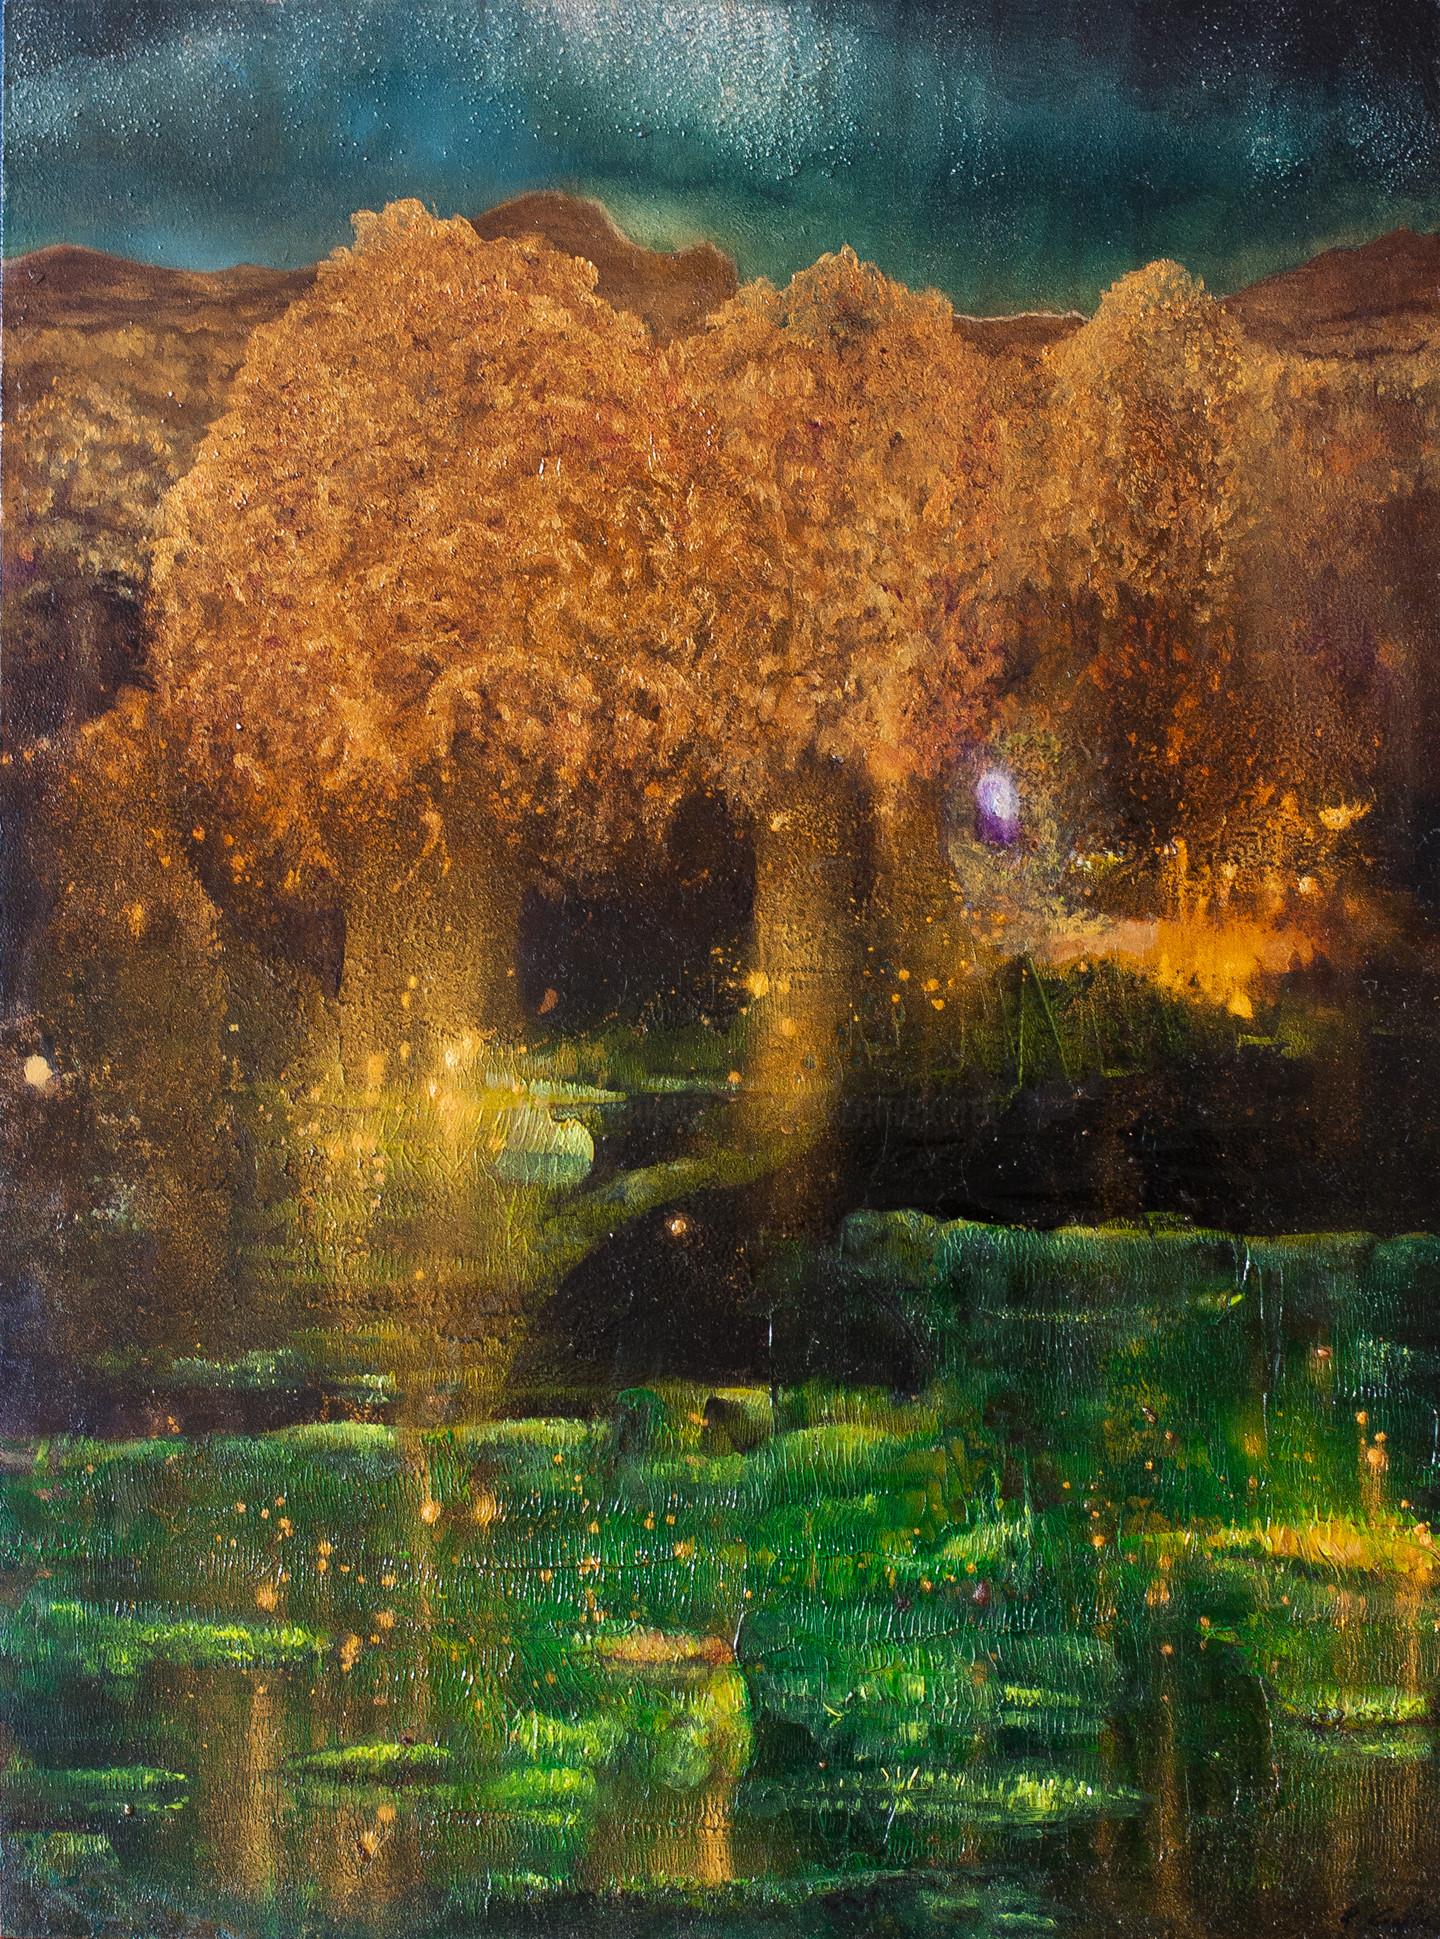 Przemek Kret - Fireflies at the Aurora Lake